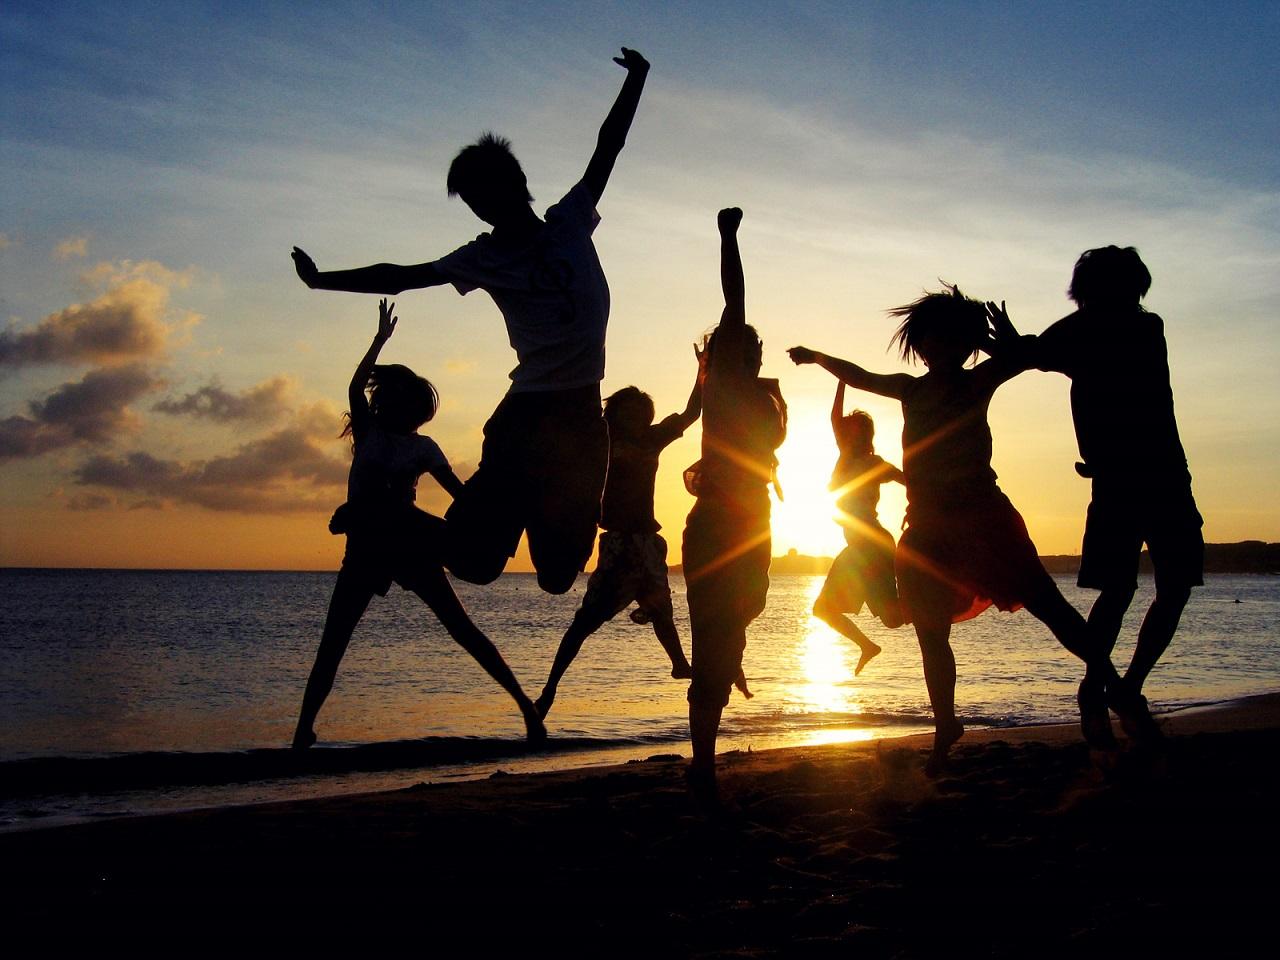 fondo_hd_43_saltando_playa